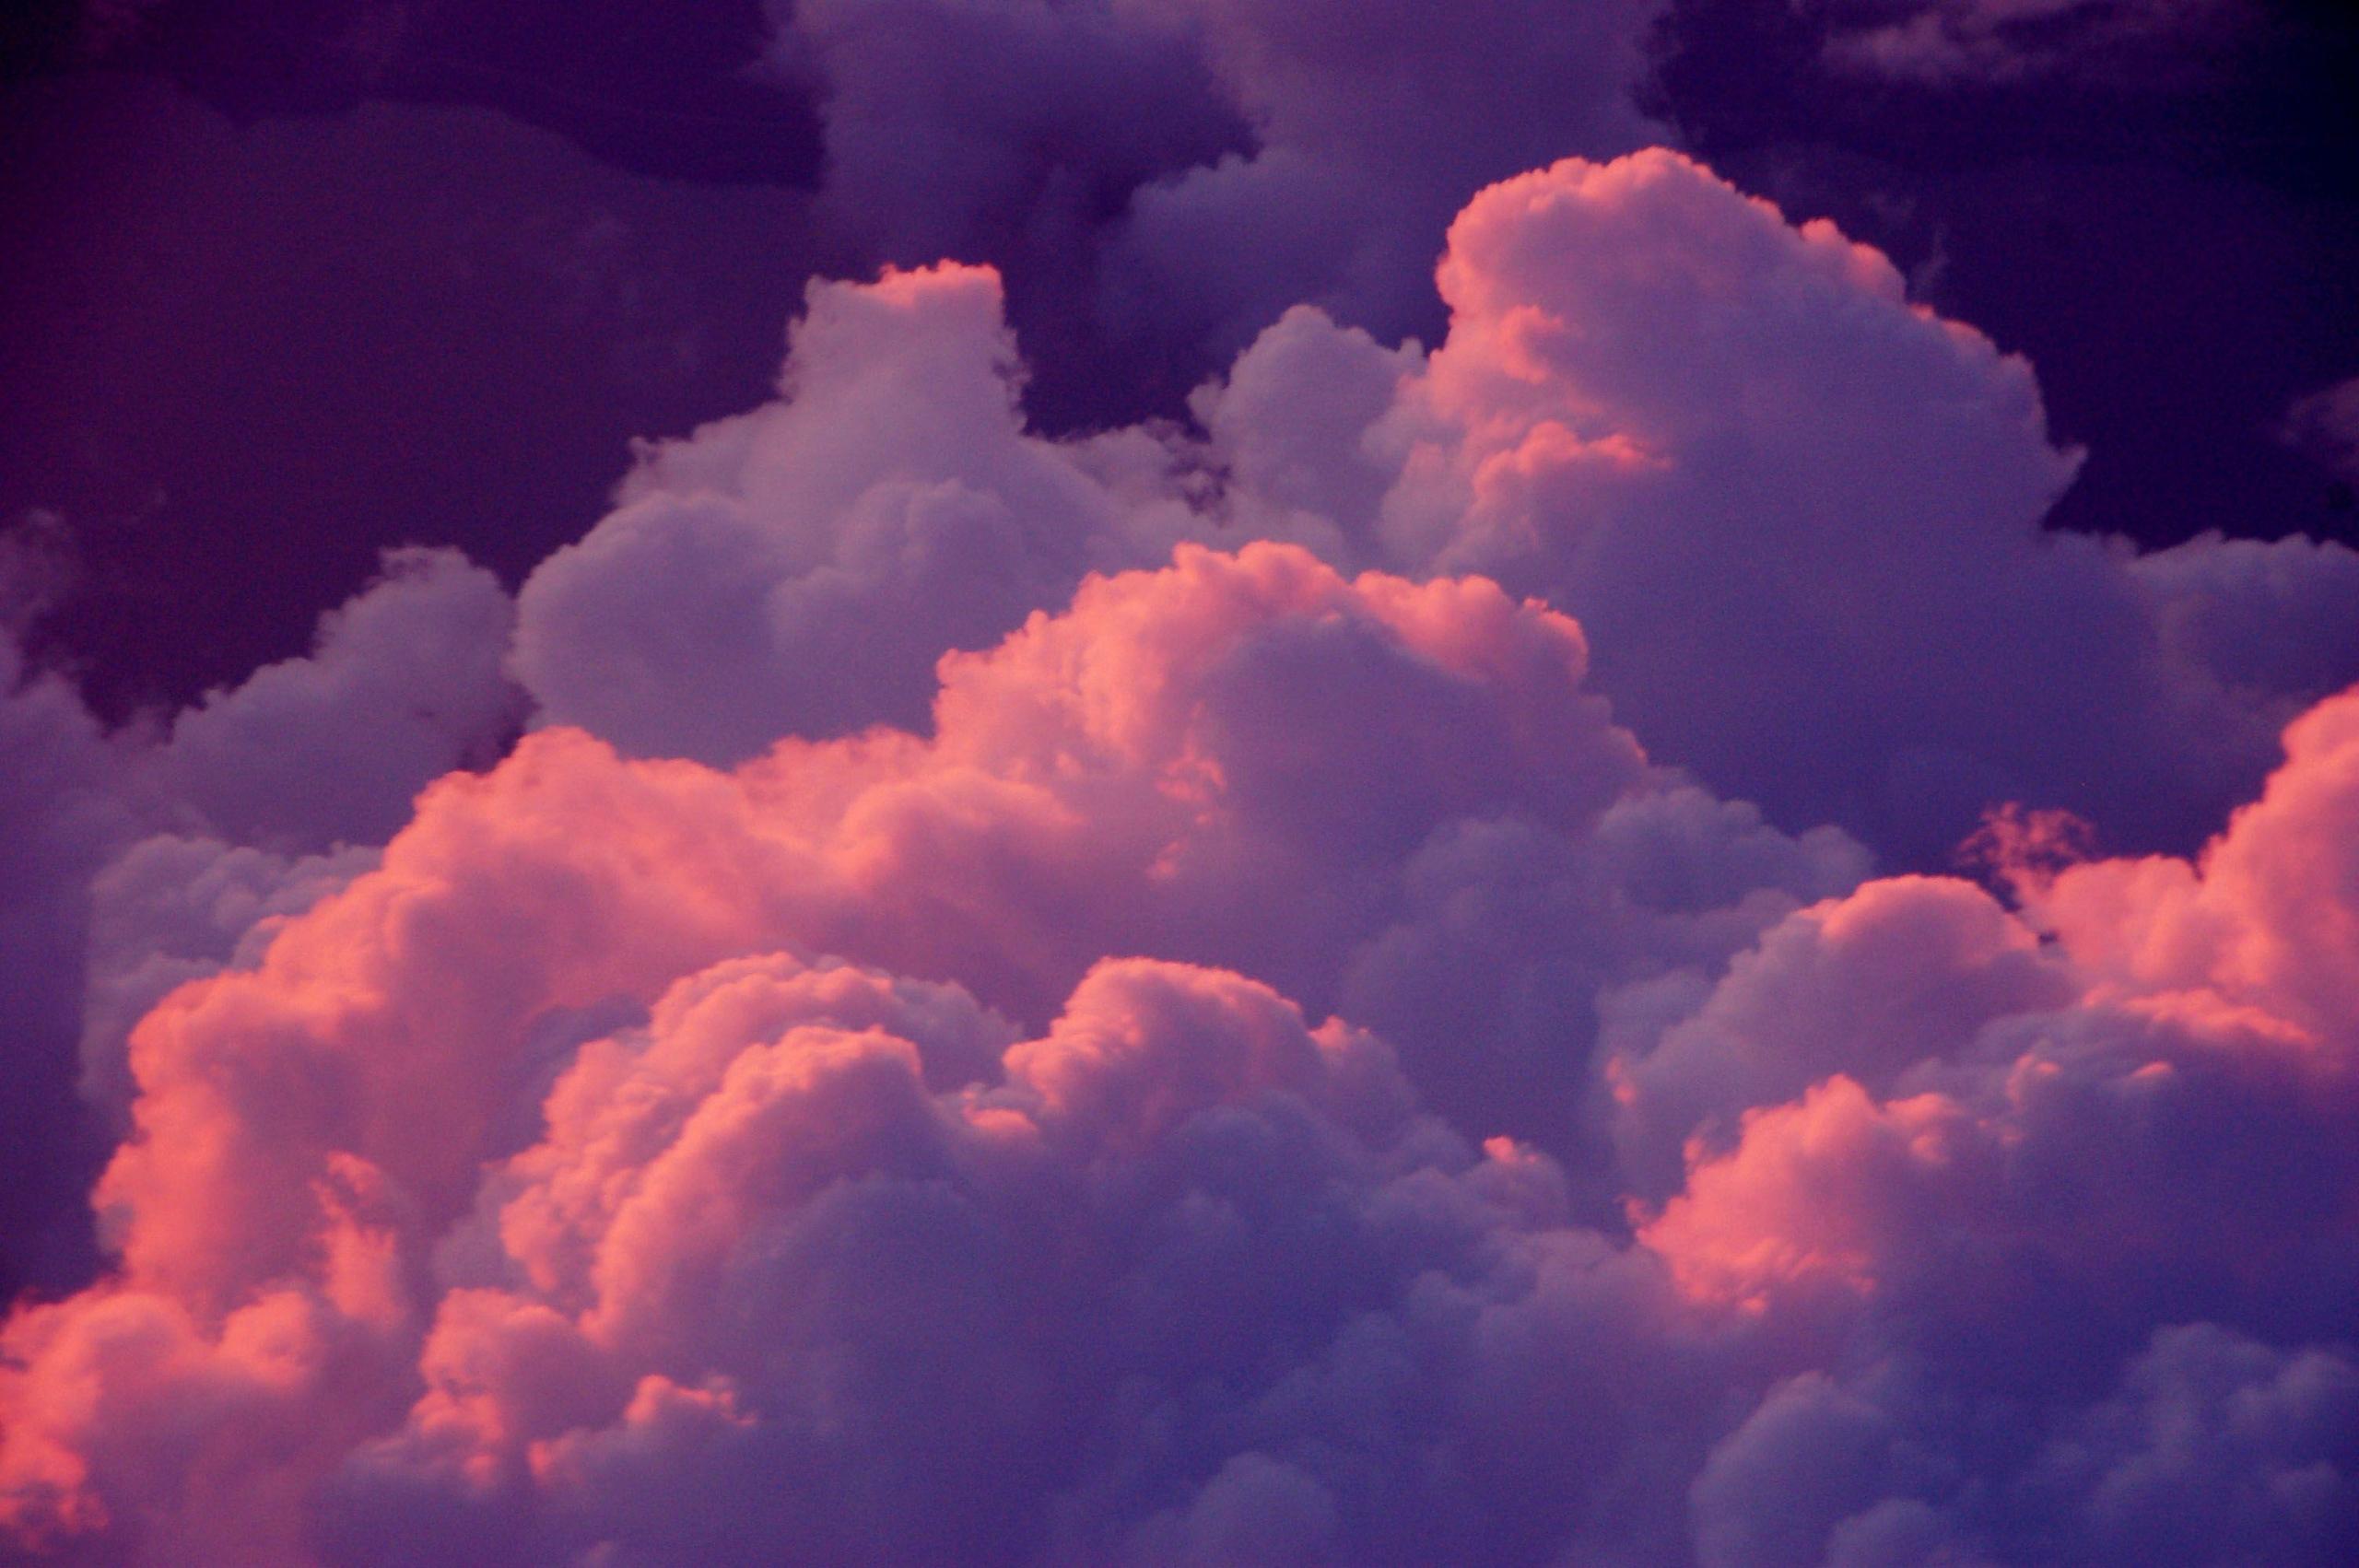 3 Factors You Should Consider When Choosing Cloud Aesthetic Wallpaper